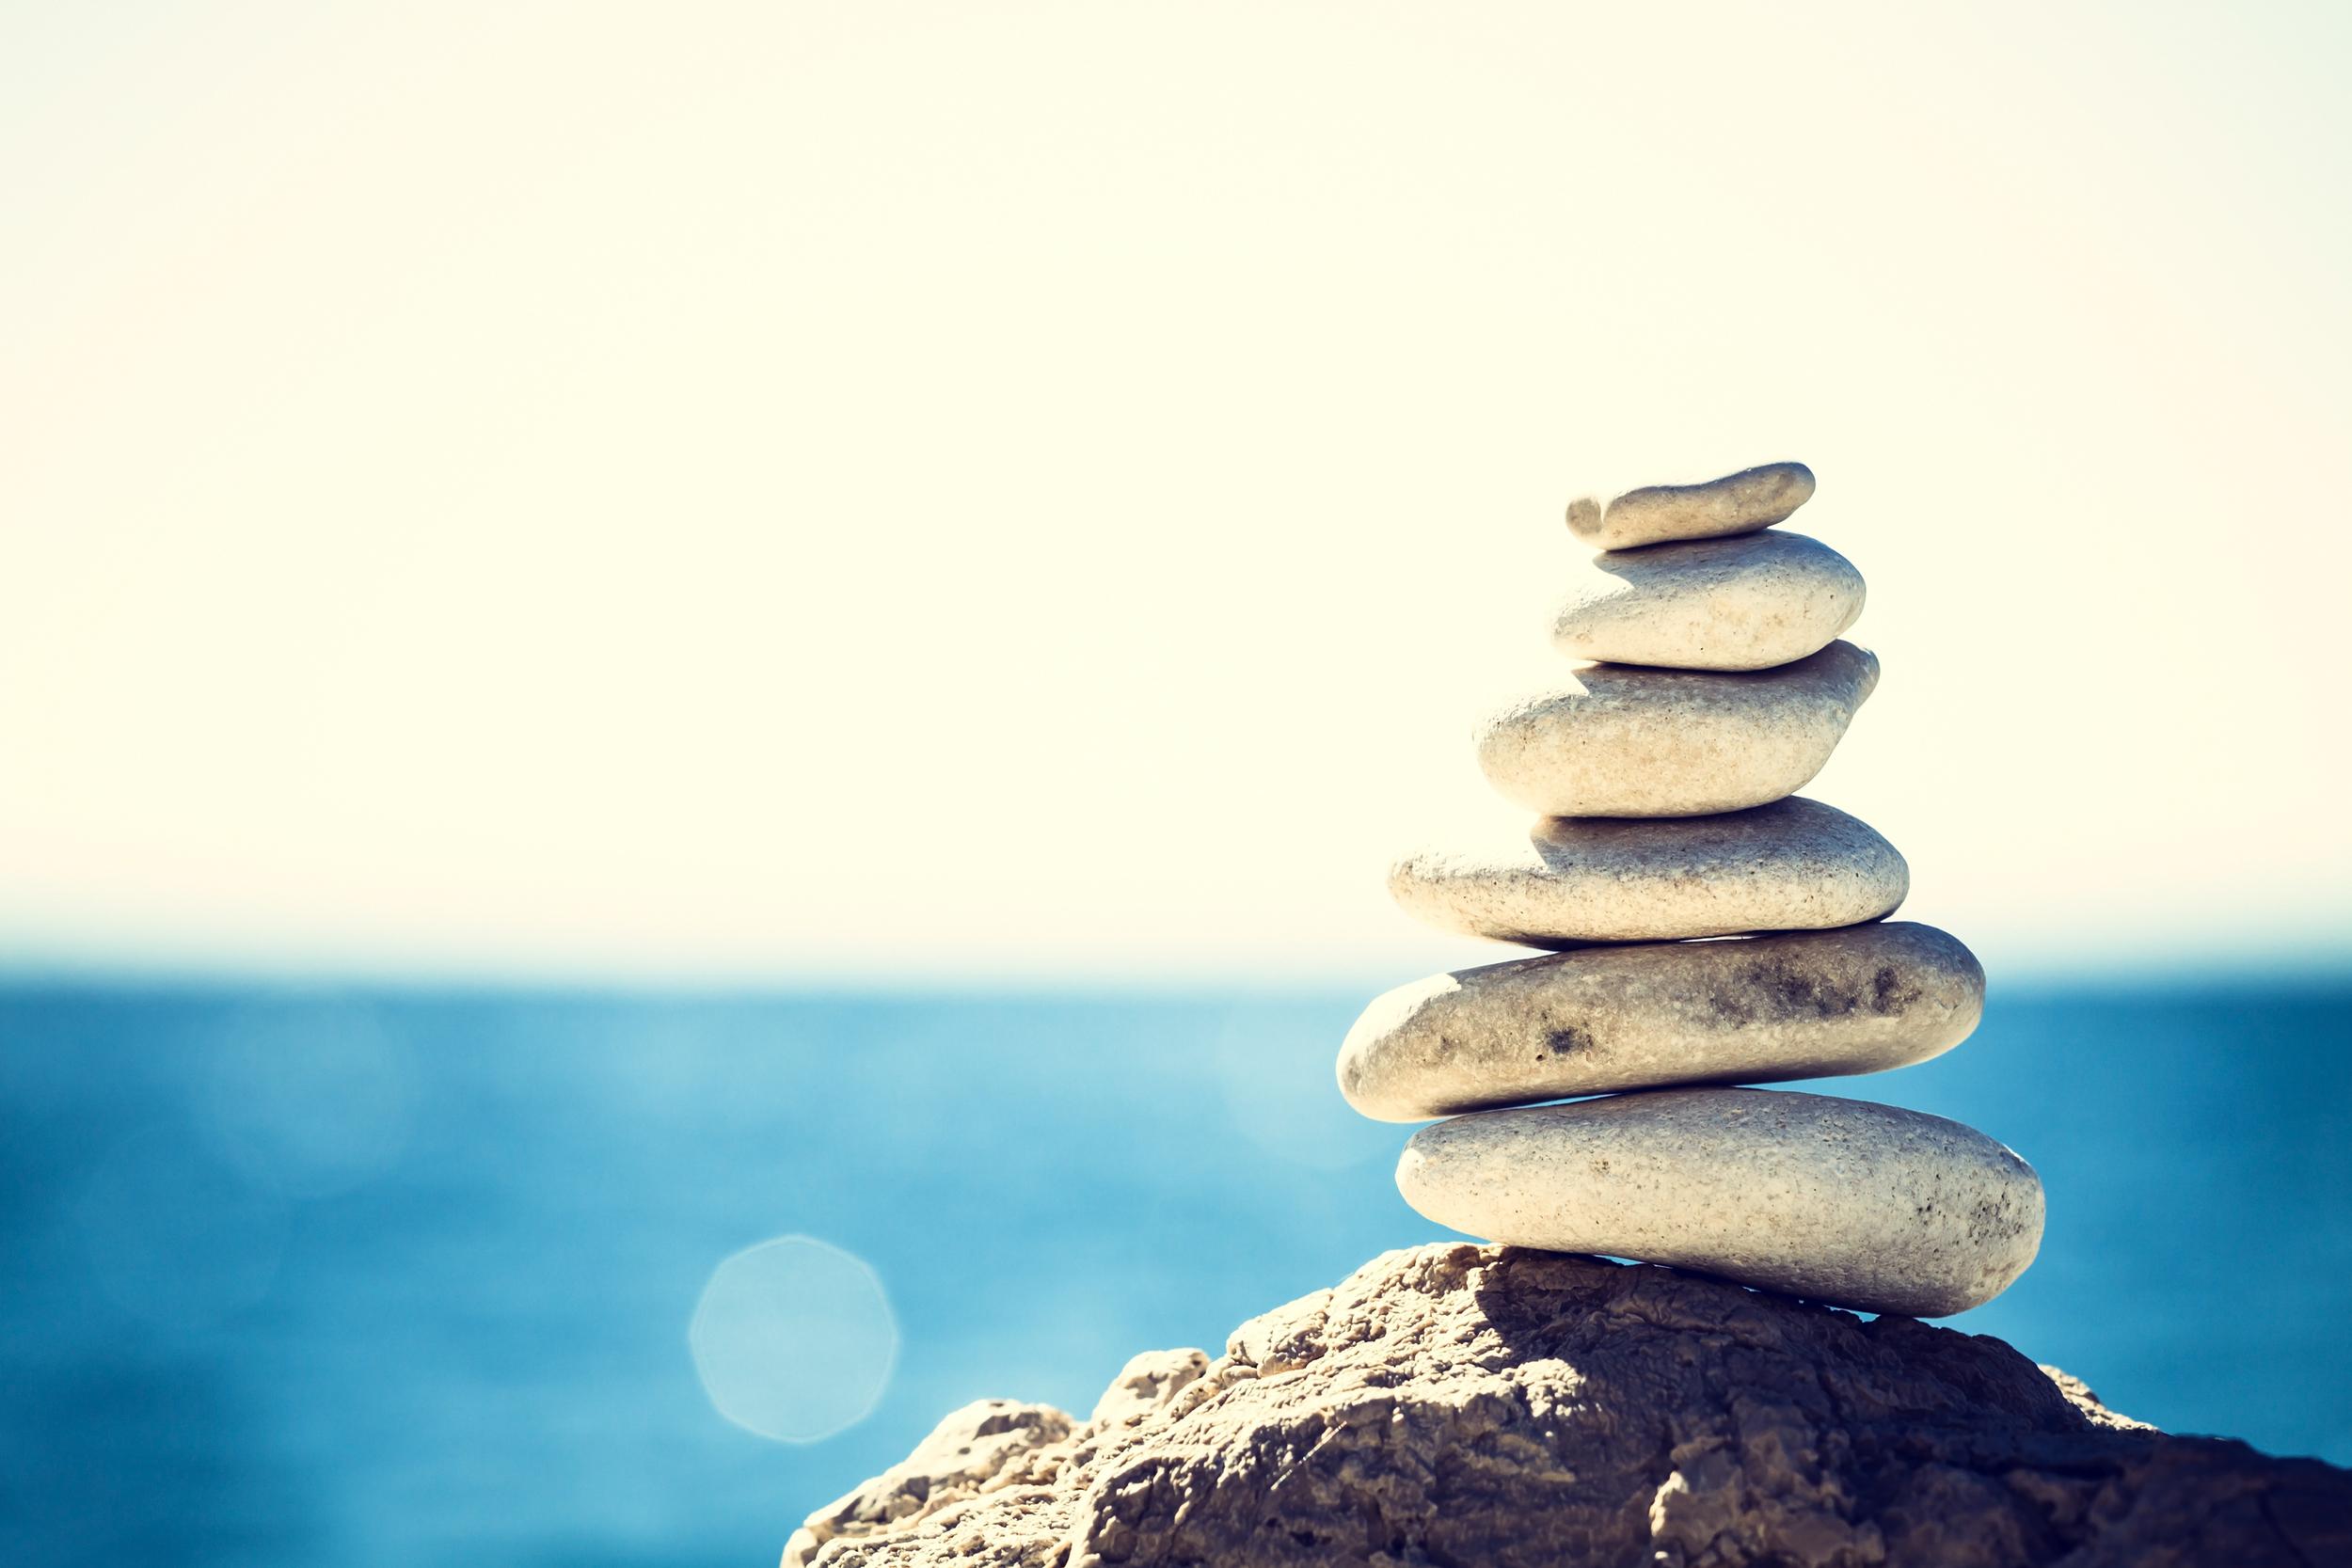 bigstock-Stones-Balance-Vintage-Pebble-76240772.jpg